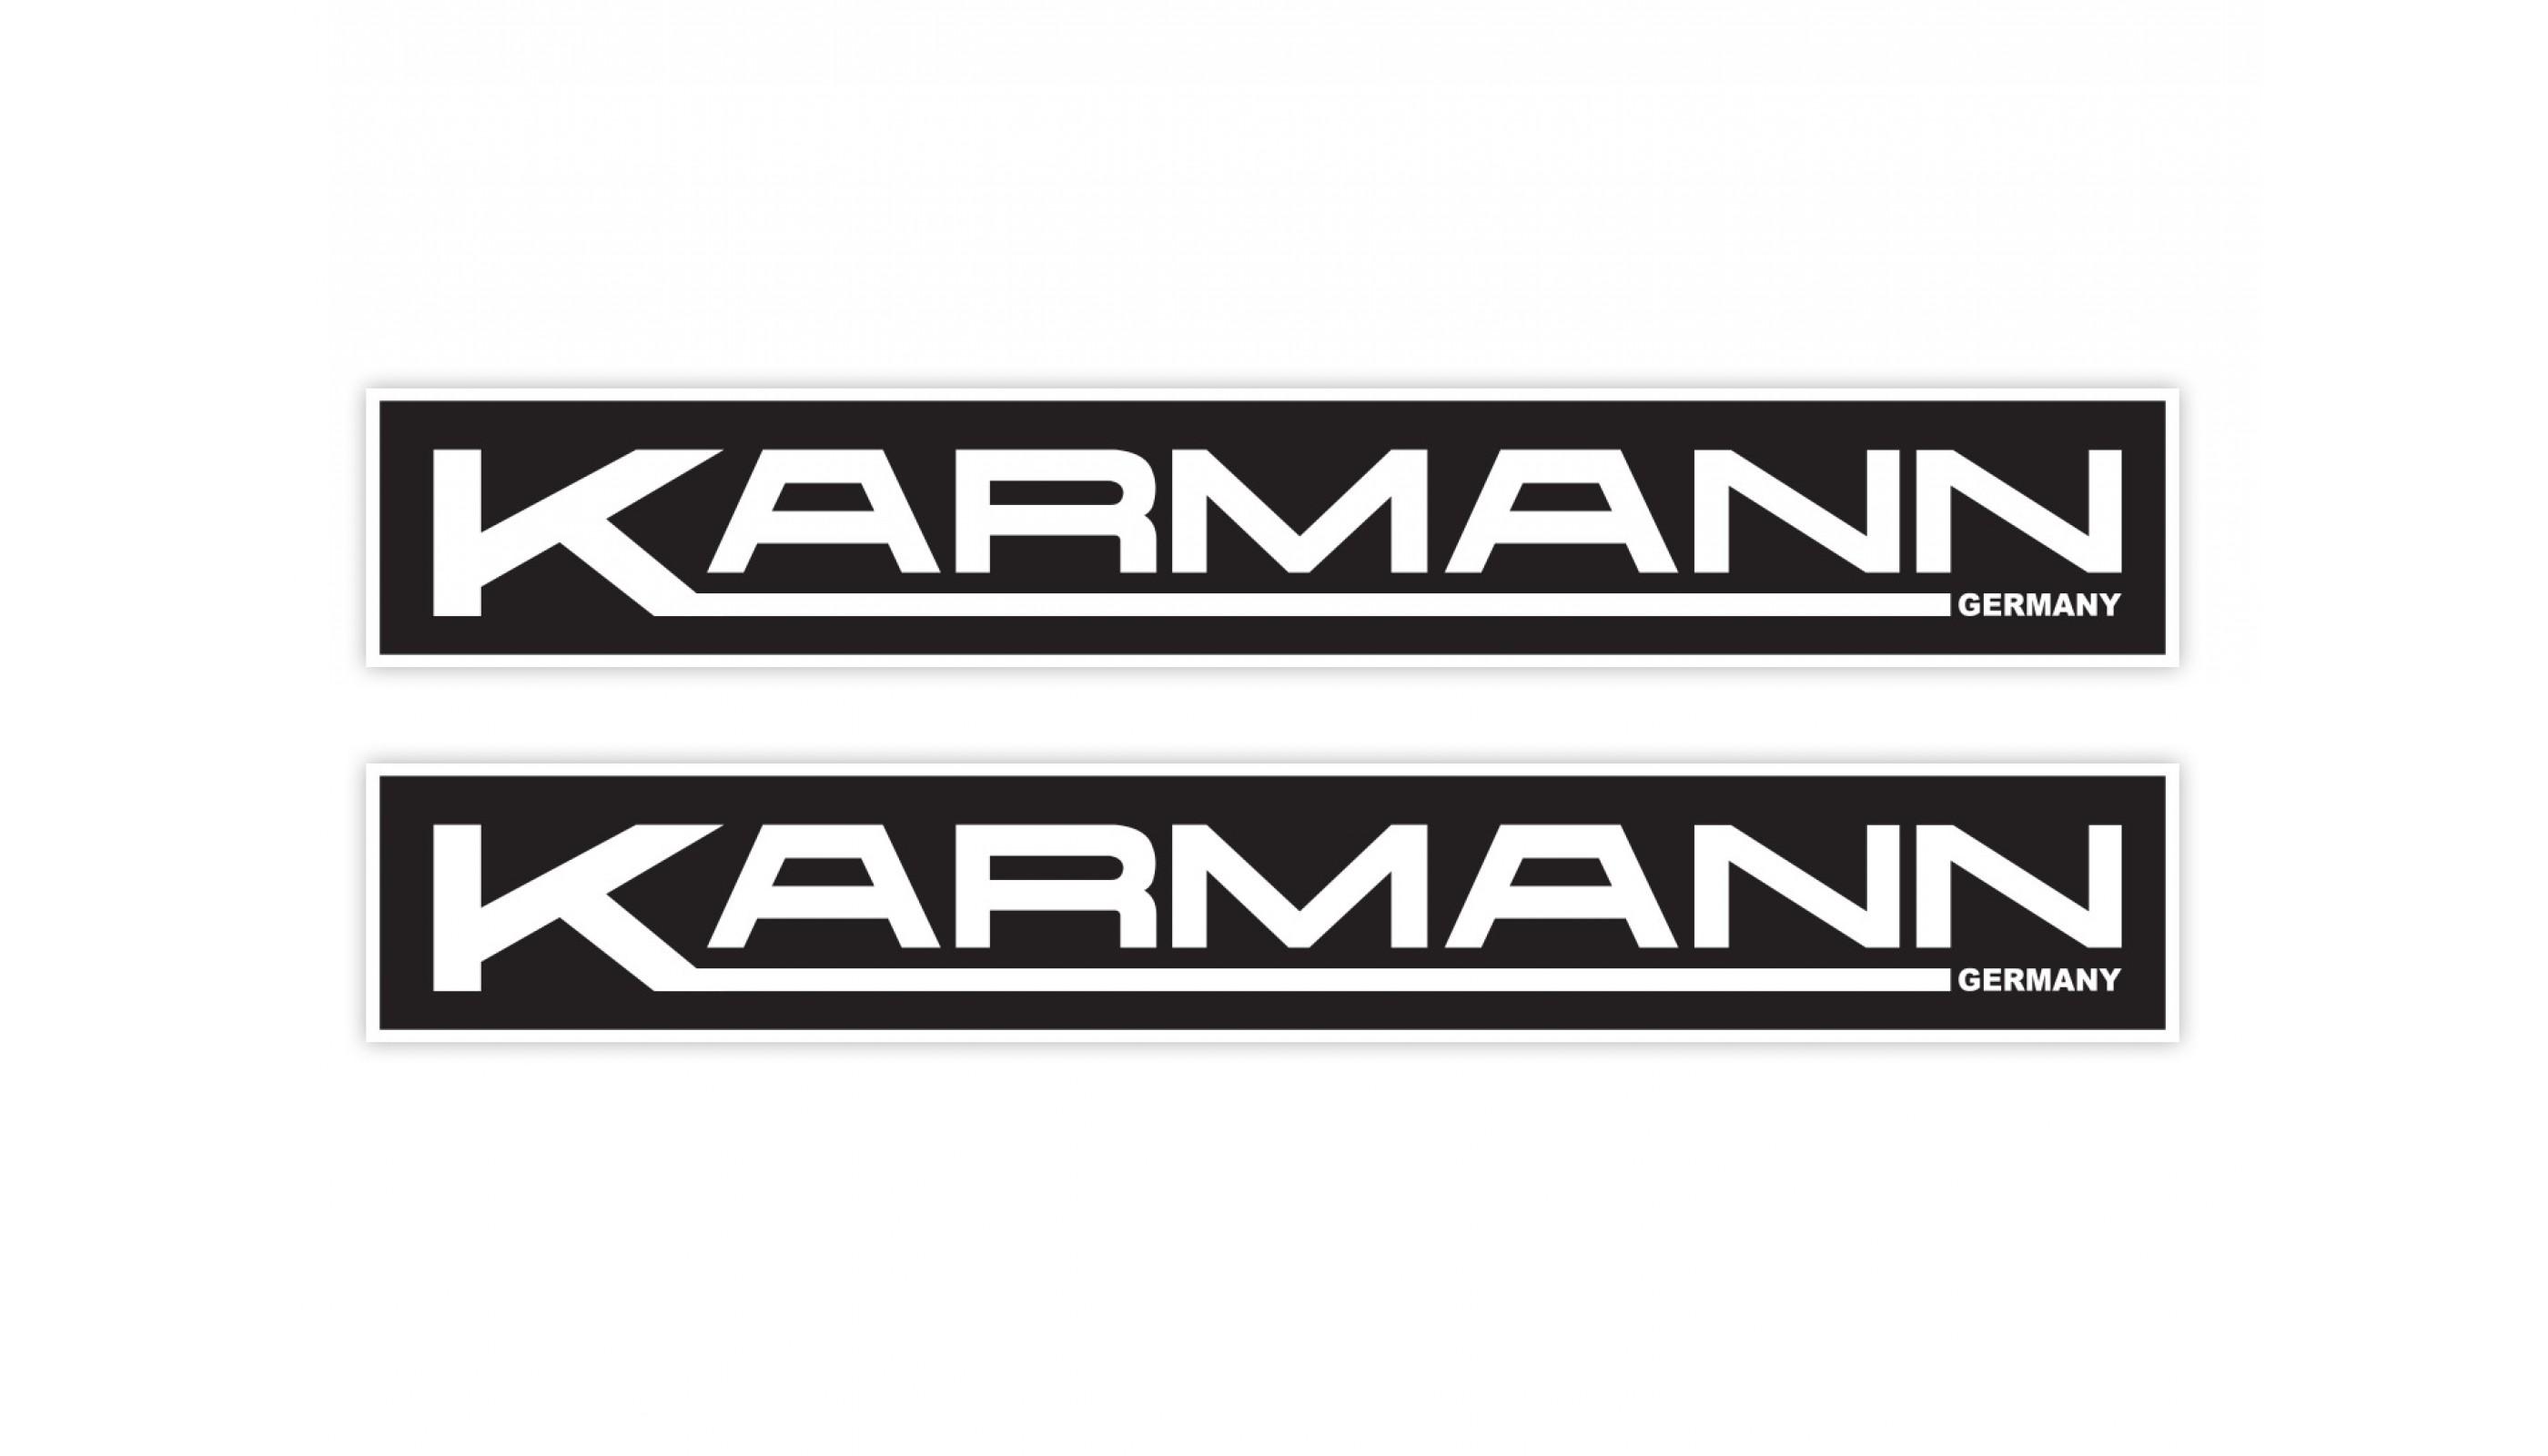 KARMANN Germany